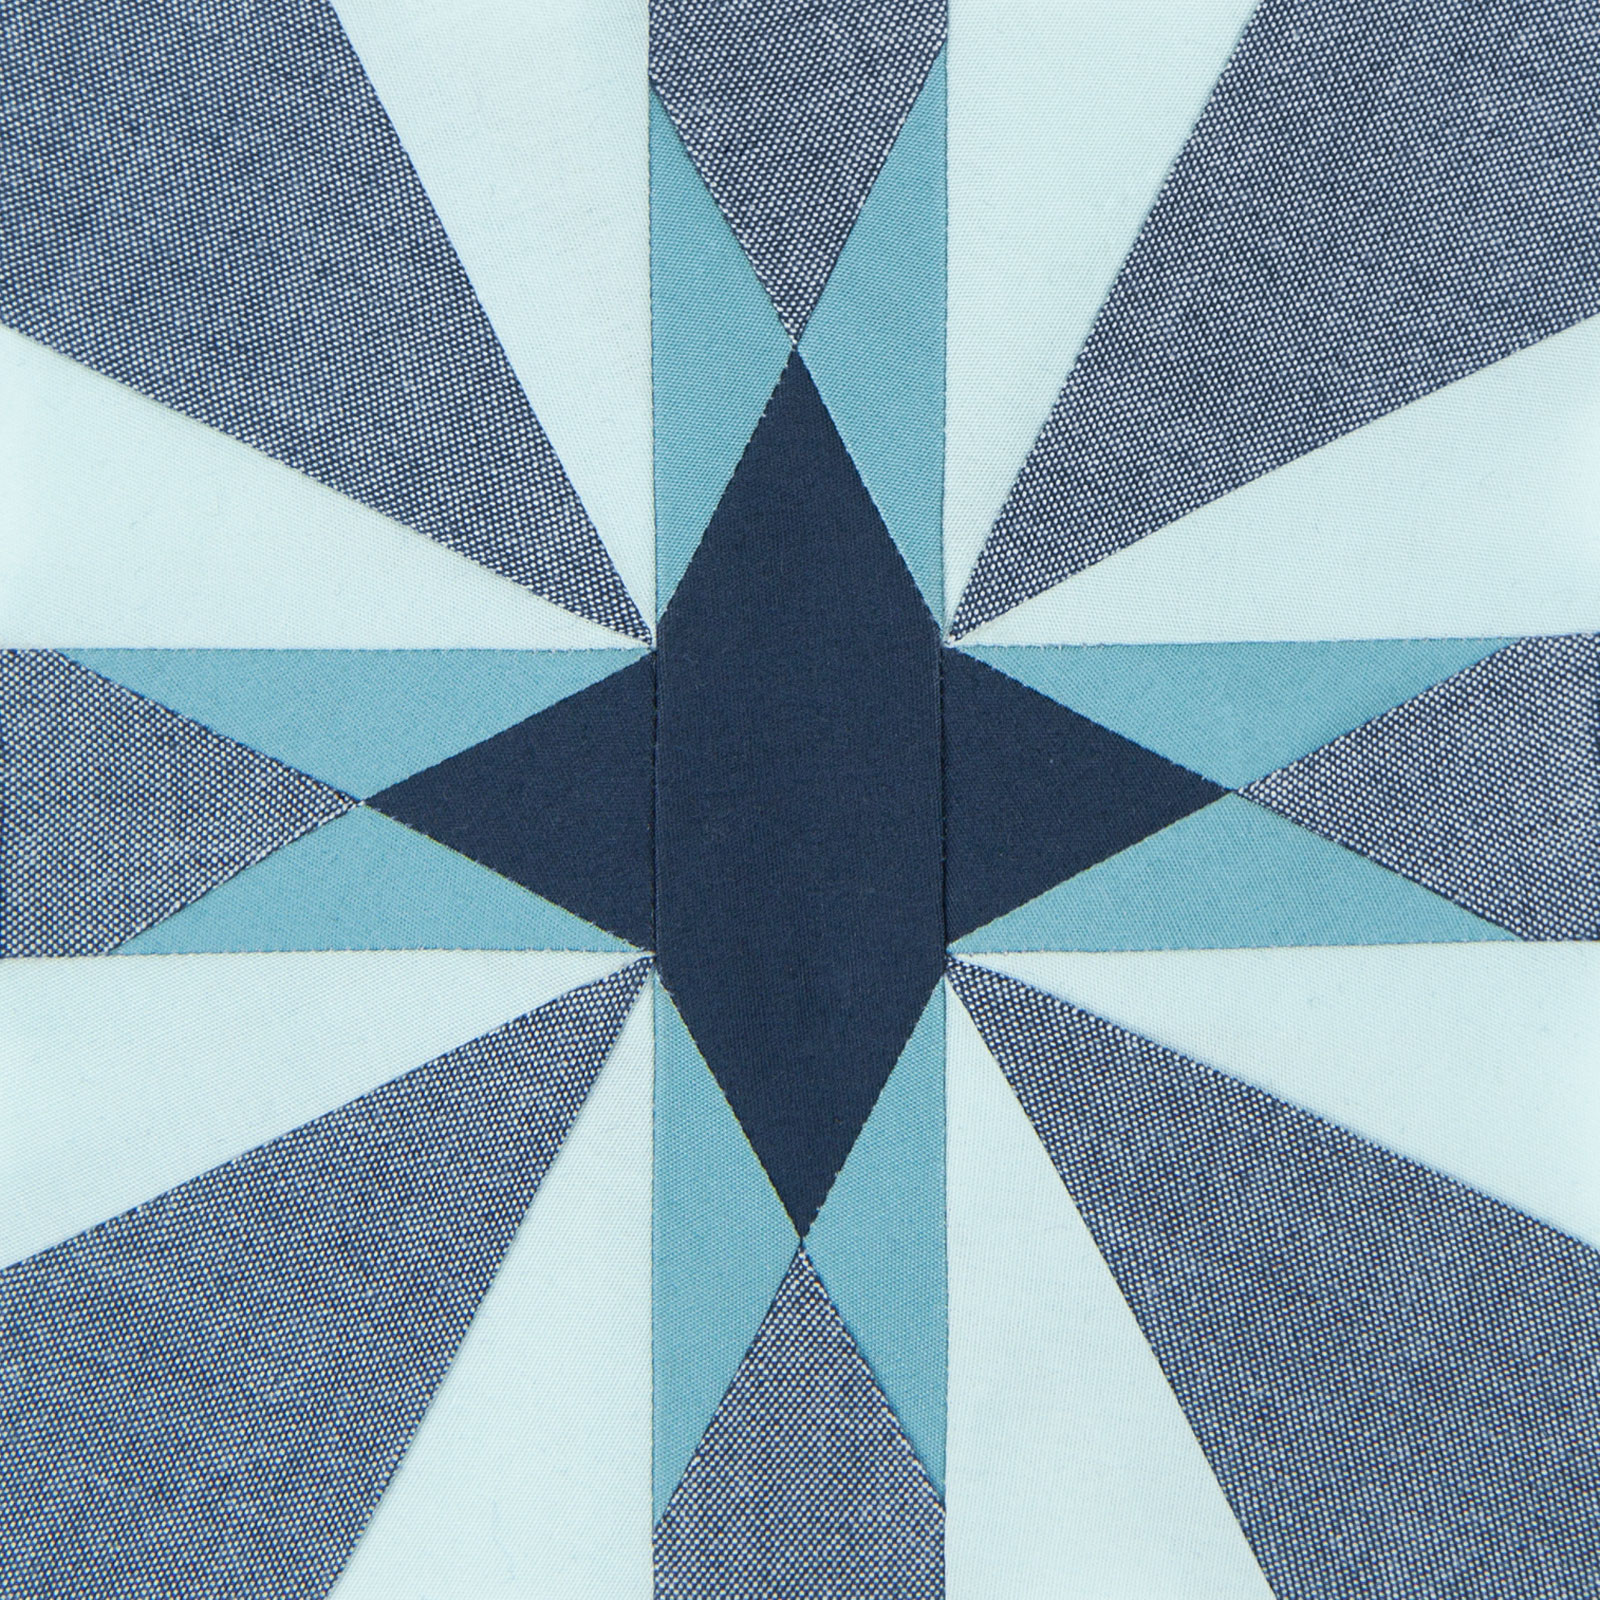 Lodestars quilt block #27: Prudence